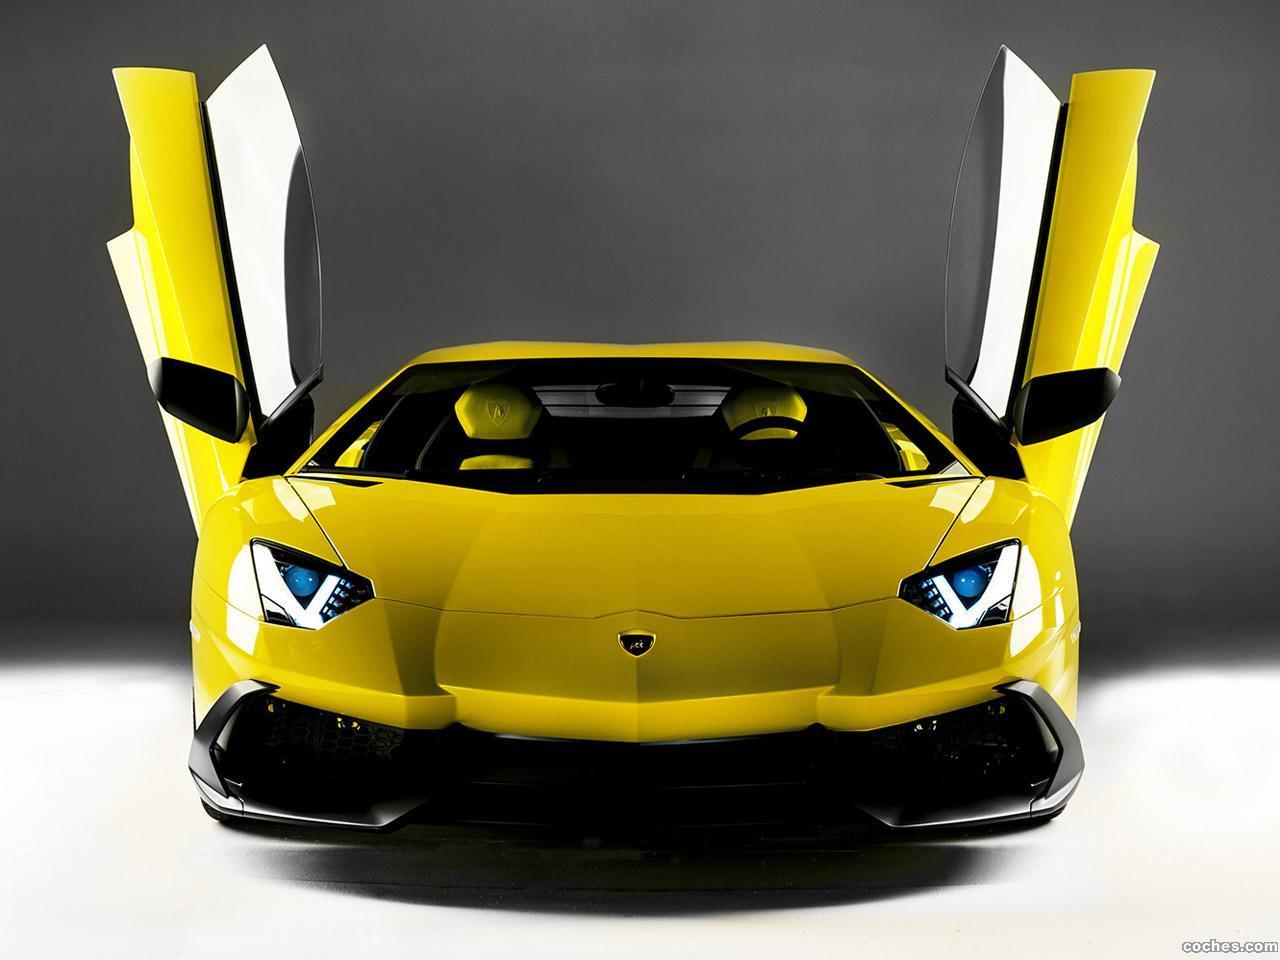 Foto 0 de Lamborghini Aventador LP720-4 50 Anniversario Edition 2013